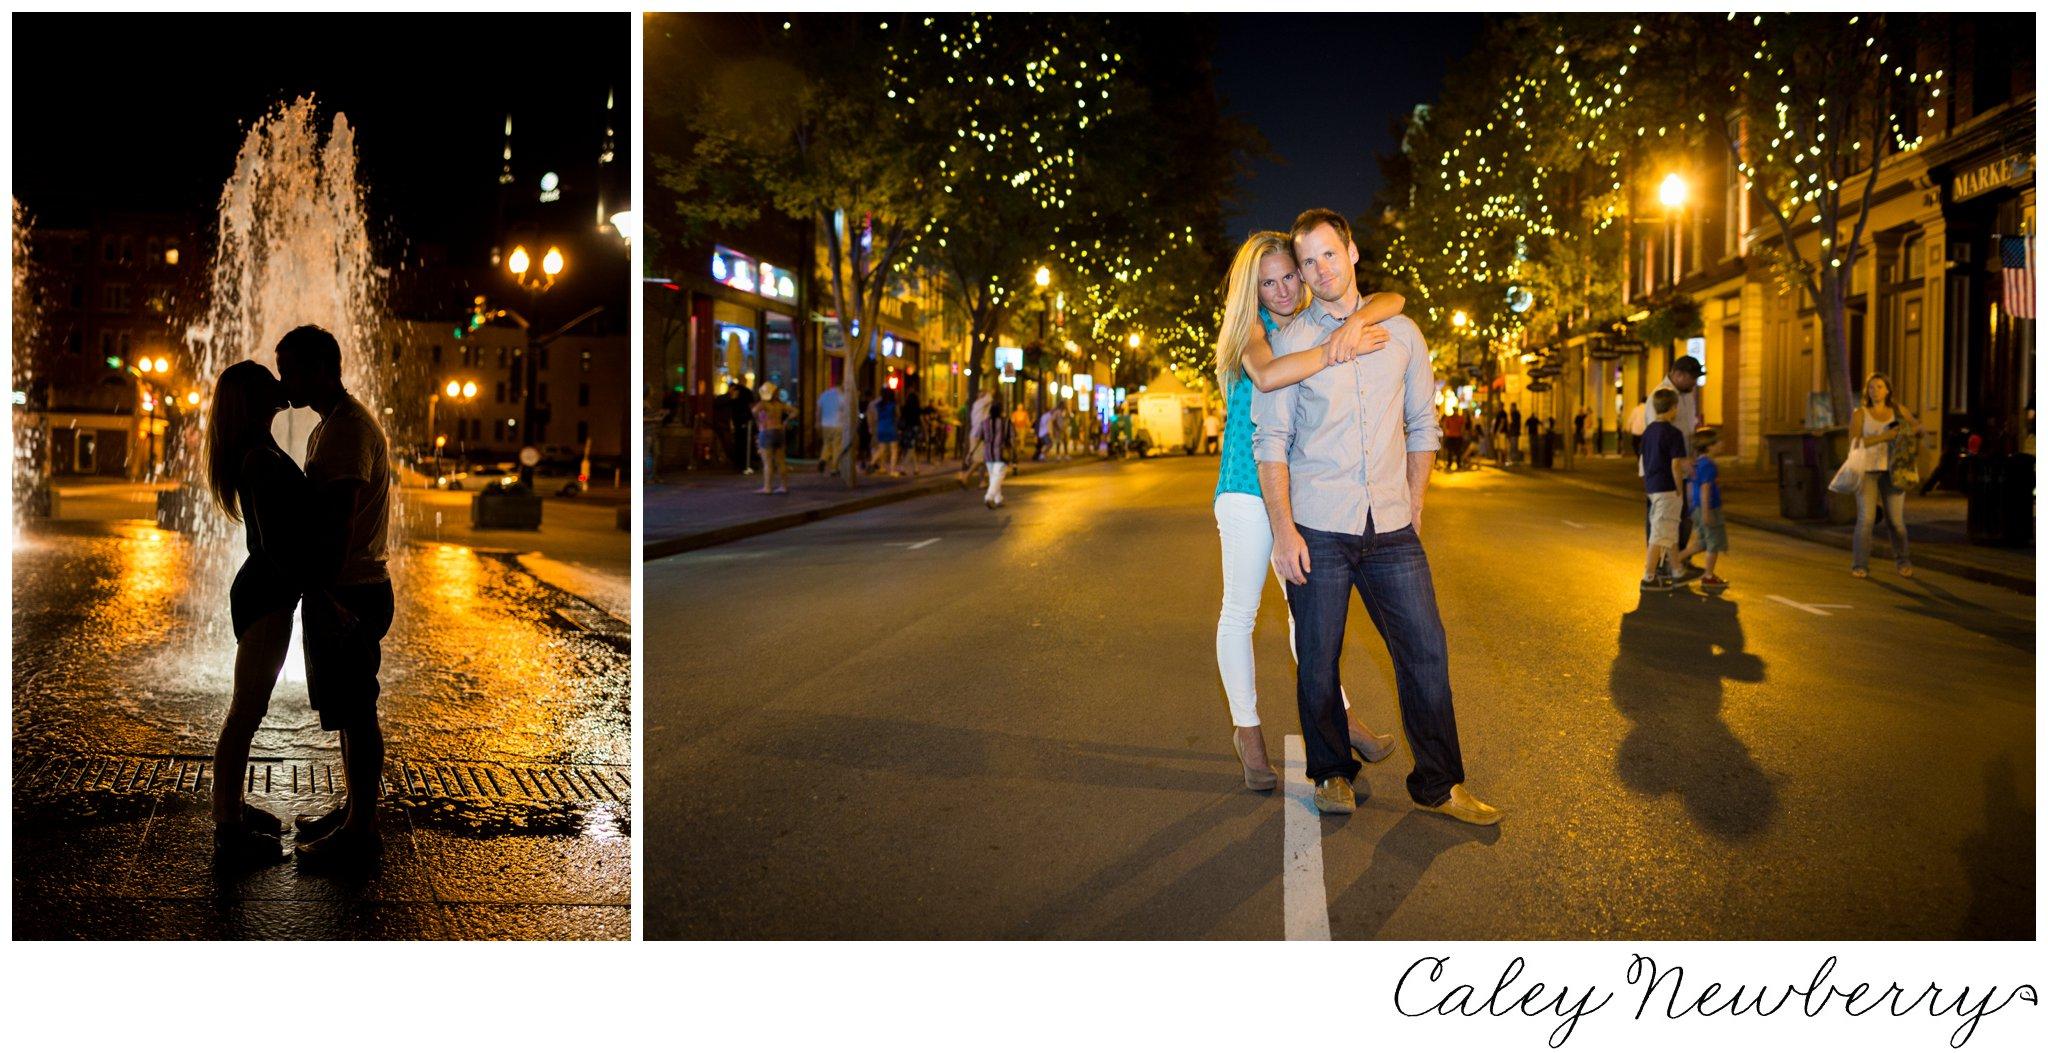 nashville-engagement-photos-at-night.jpg